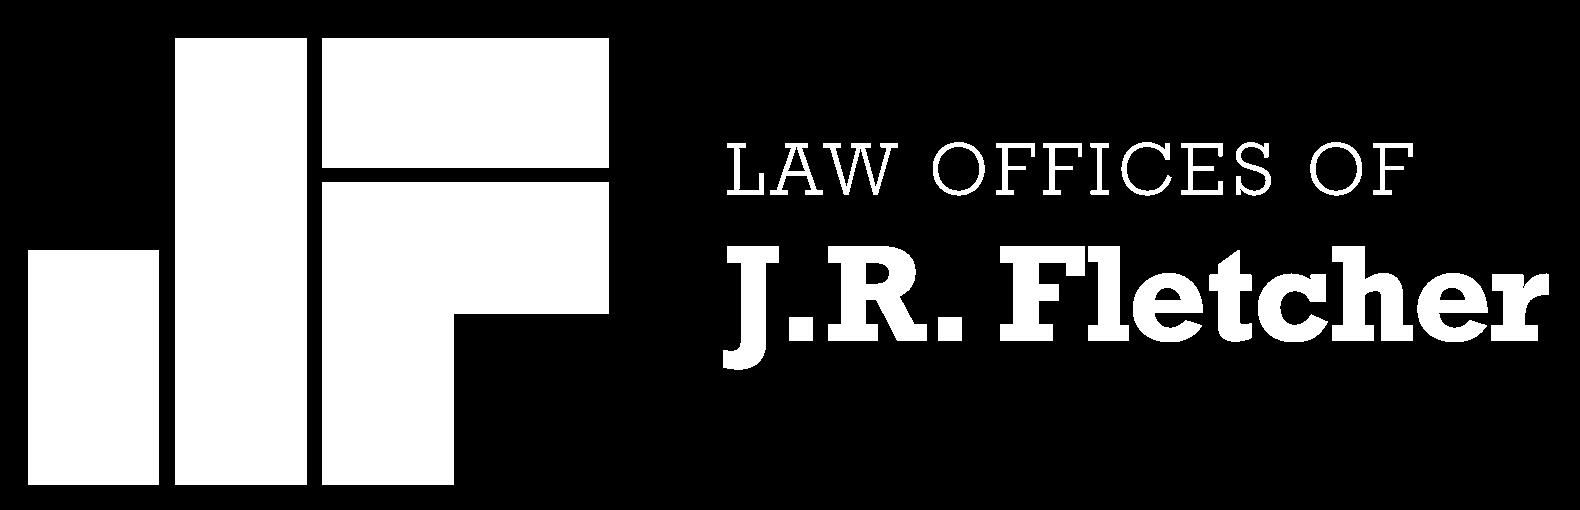 Law Offices of J.R. Fletcher, PLLC